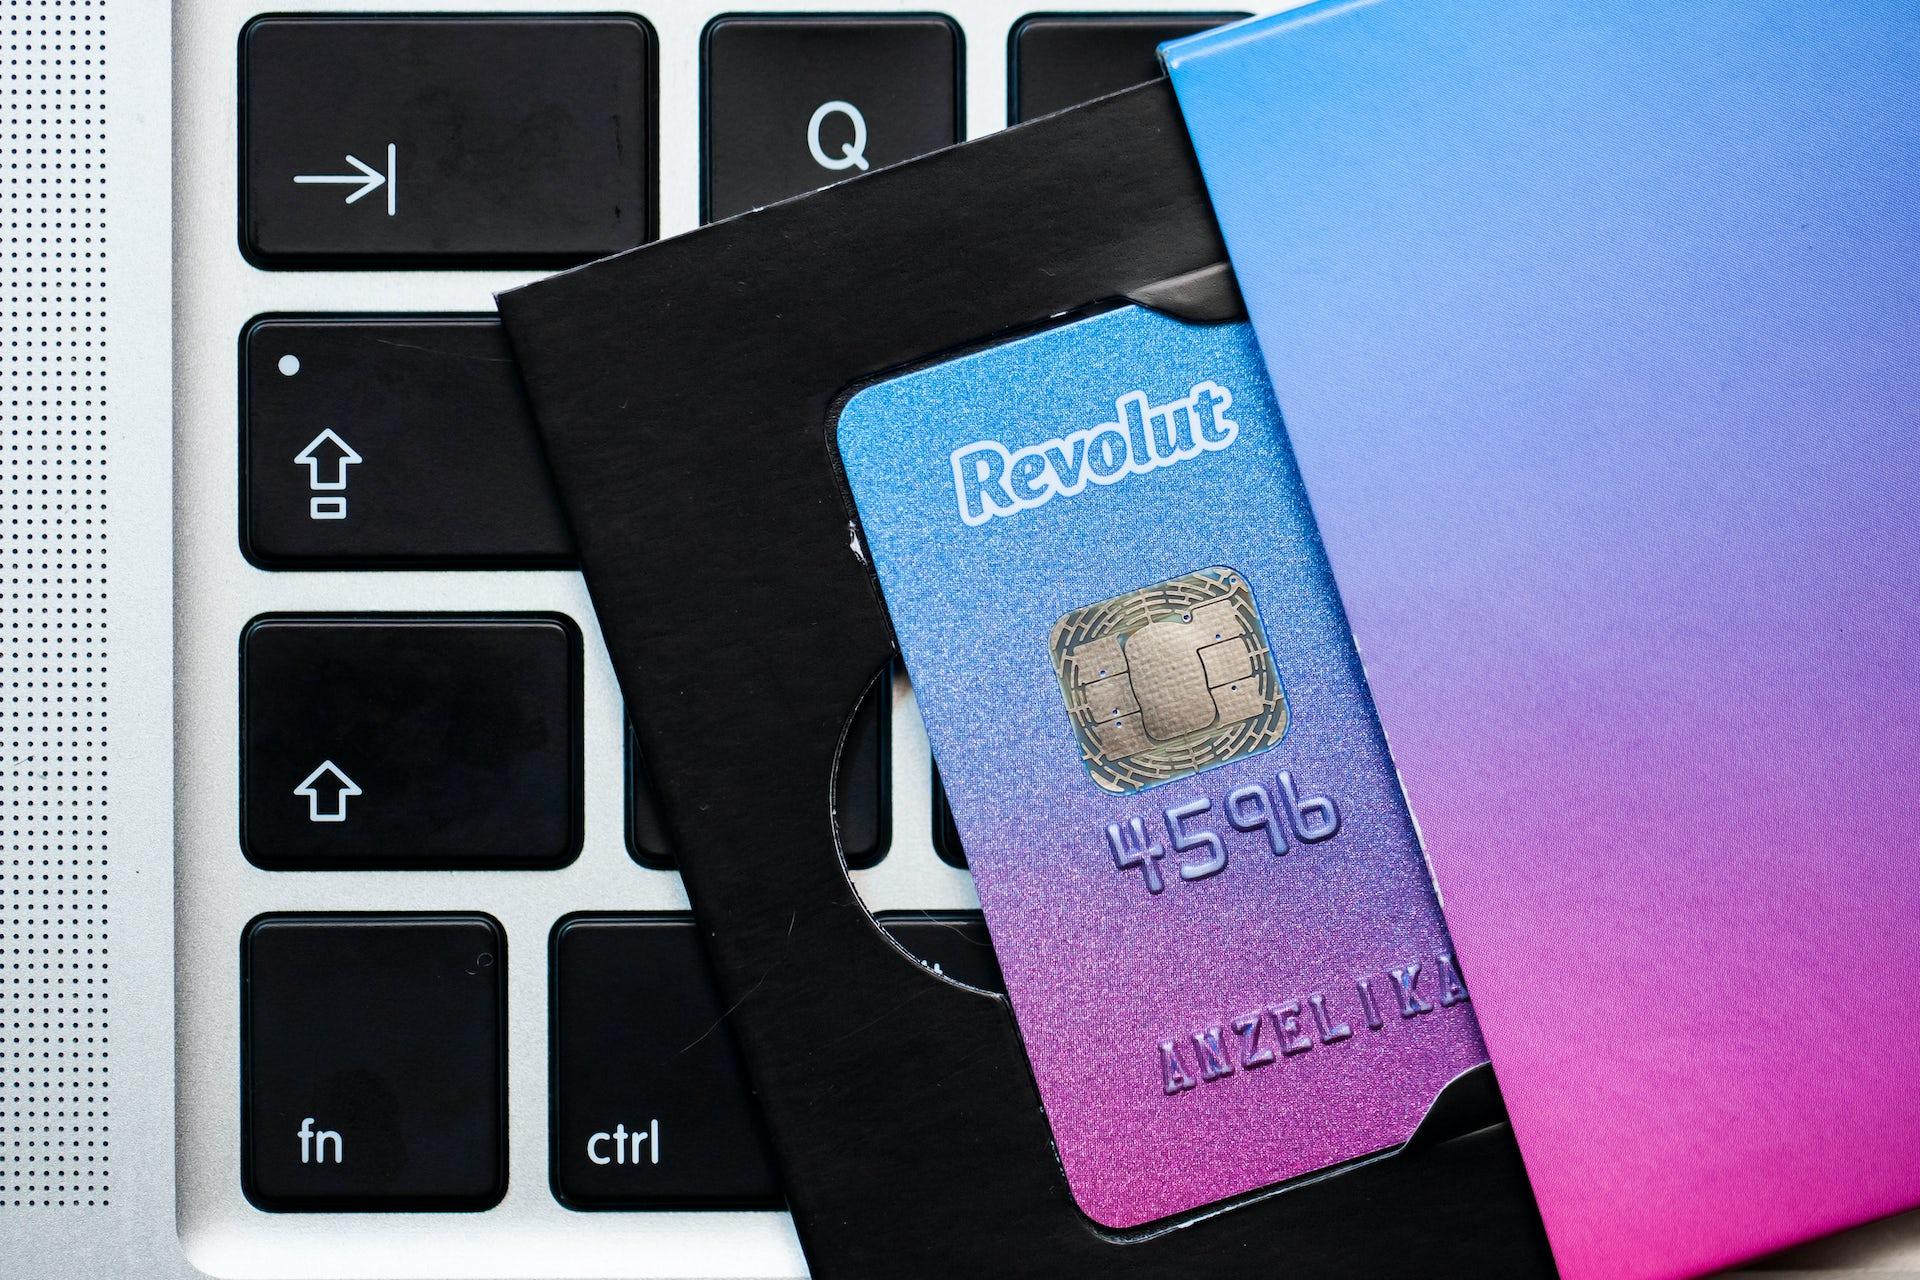 Revolut: could allegations of Russian involvement sidetrack a fintech revolution?